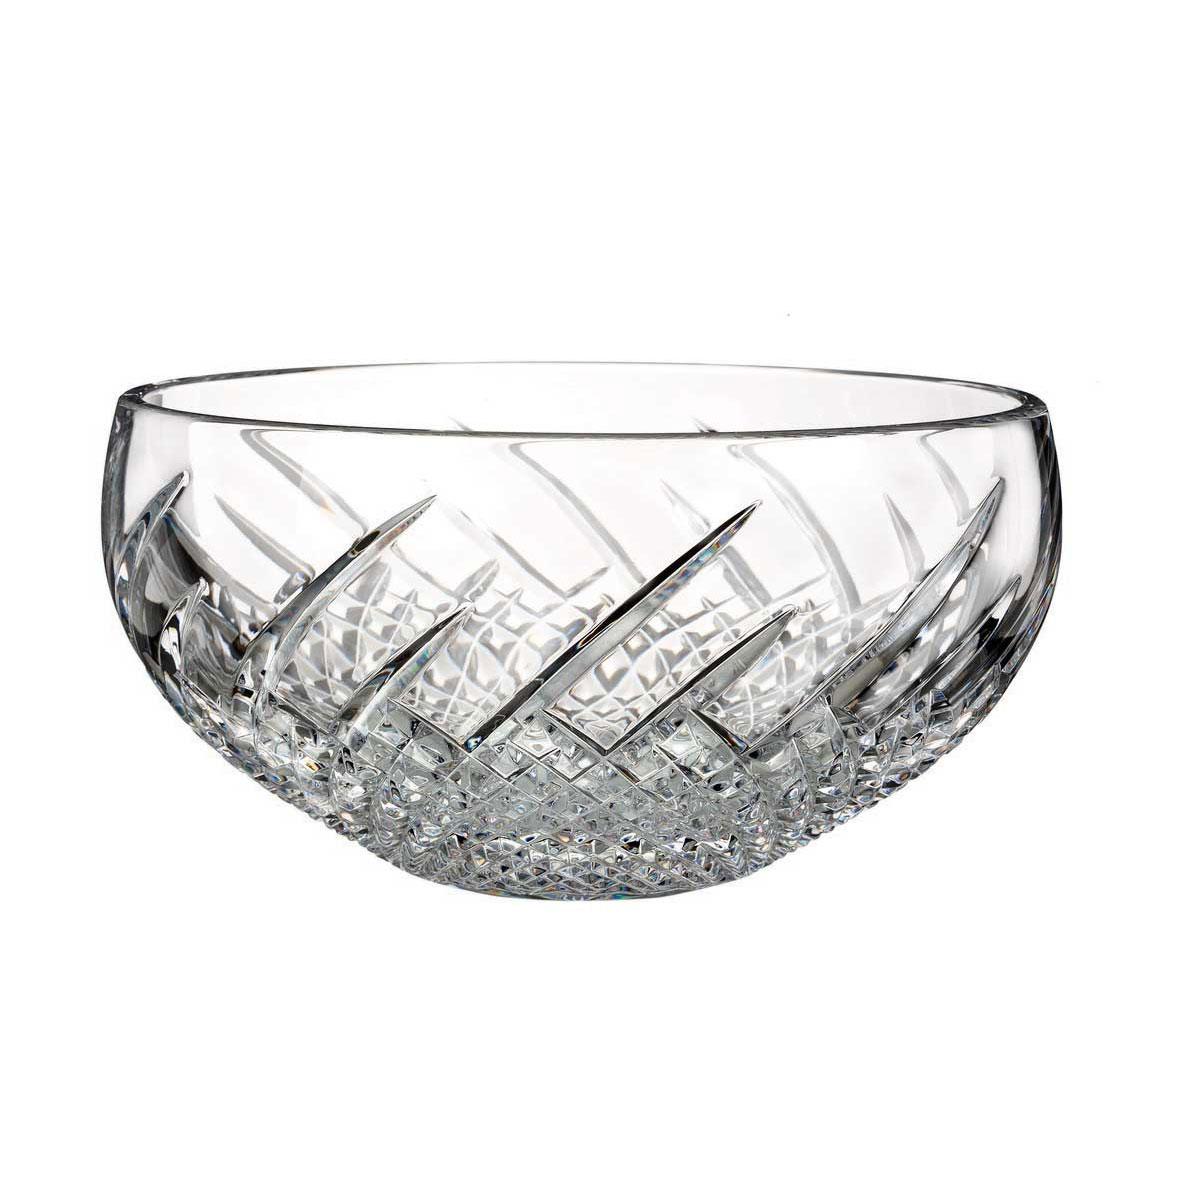 "Waterford Crystal, House of Waterford Wild Atlantic Way 9"" Crystal Bowl"